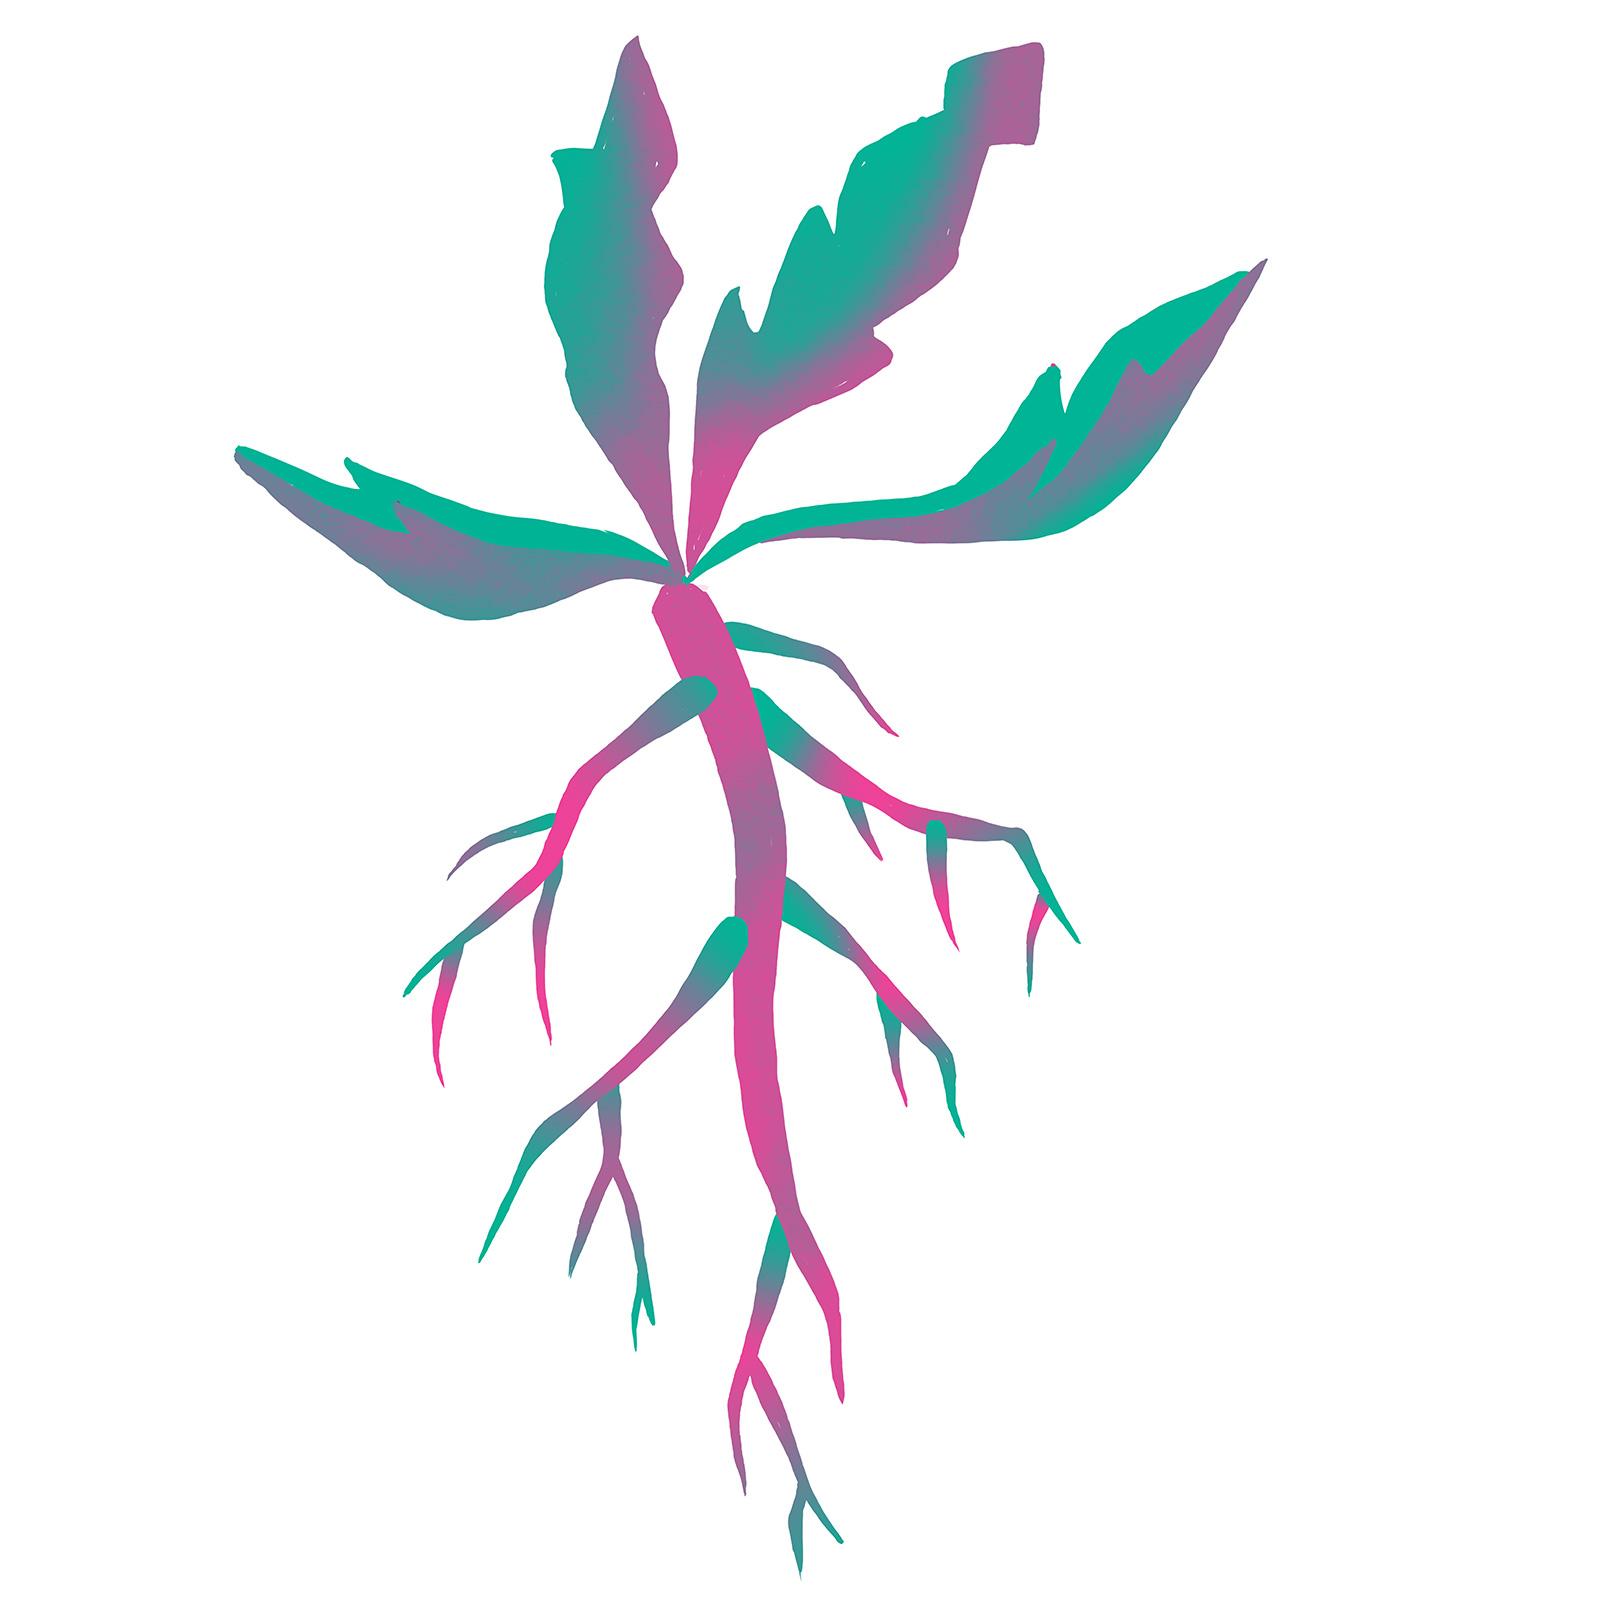 taproot-biomimicry-digital-illustration-by-Fiona-Dunnett.jpg